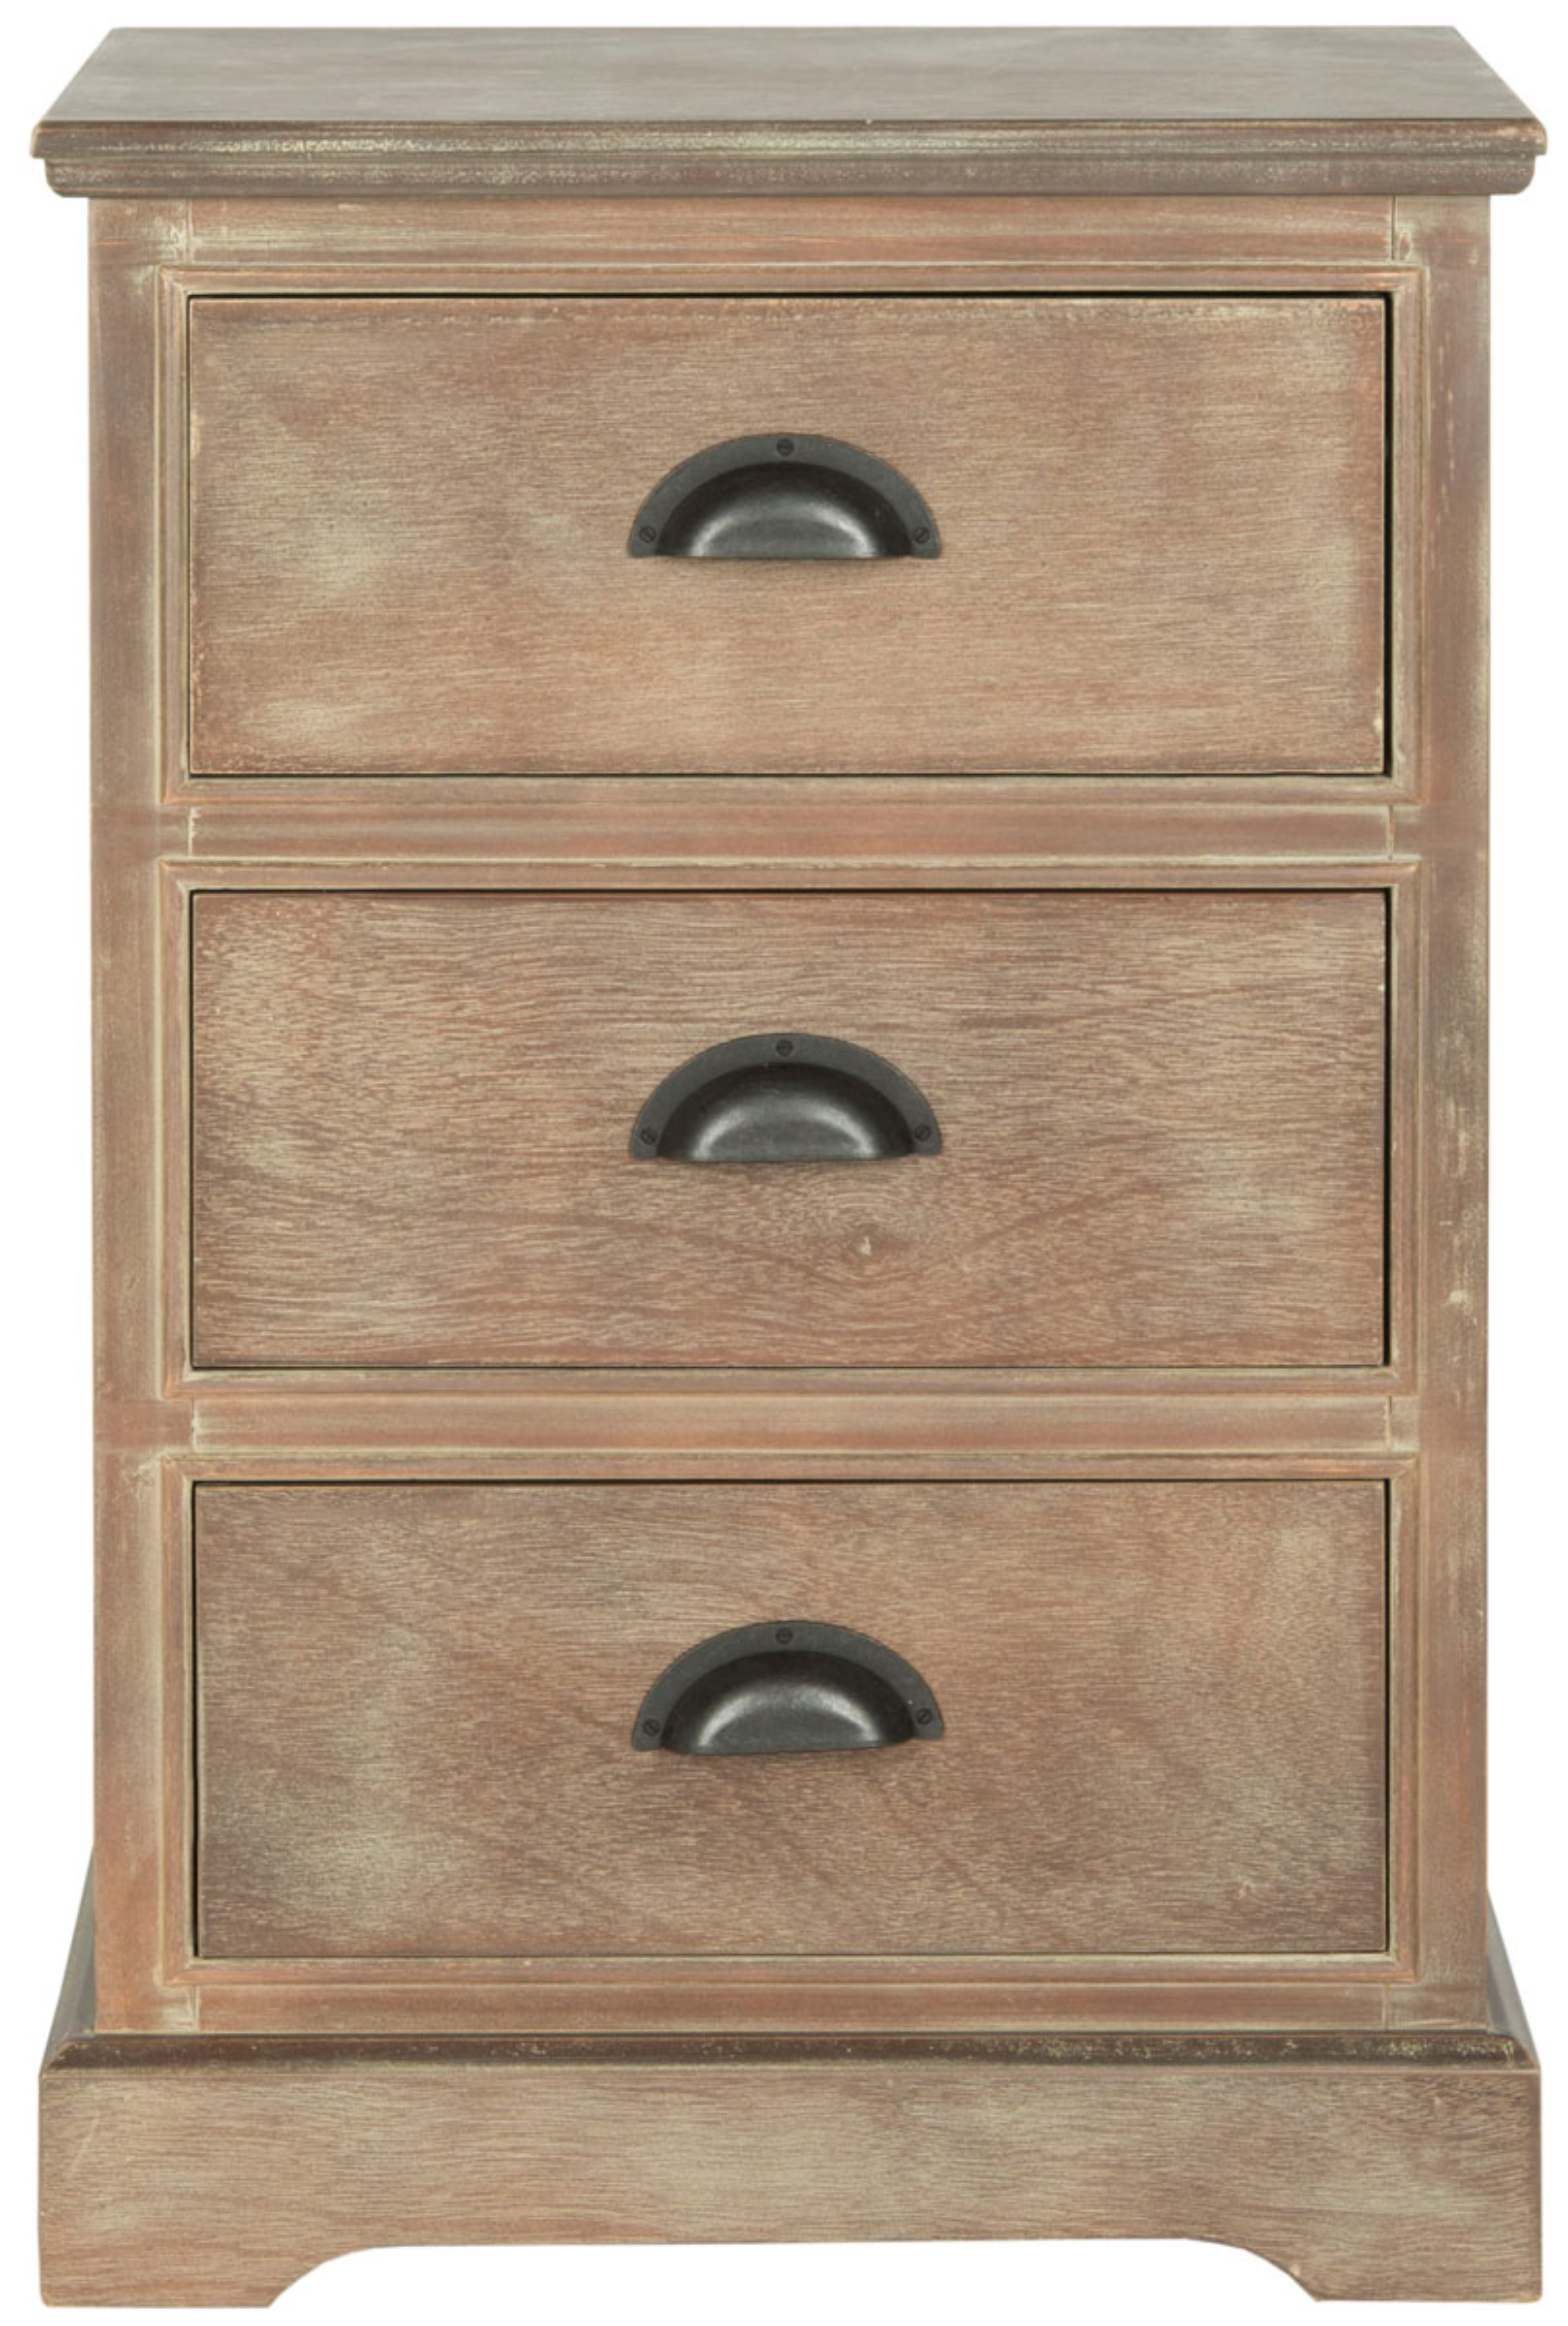 Table d'appoint 3 tiroirs en bois de pin moka